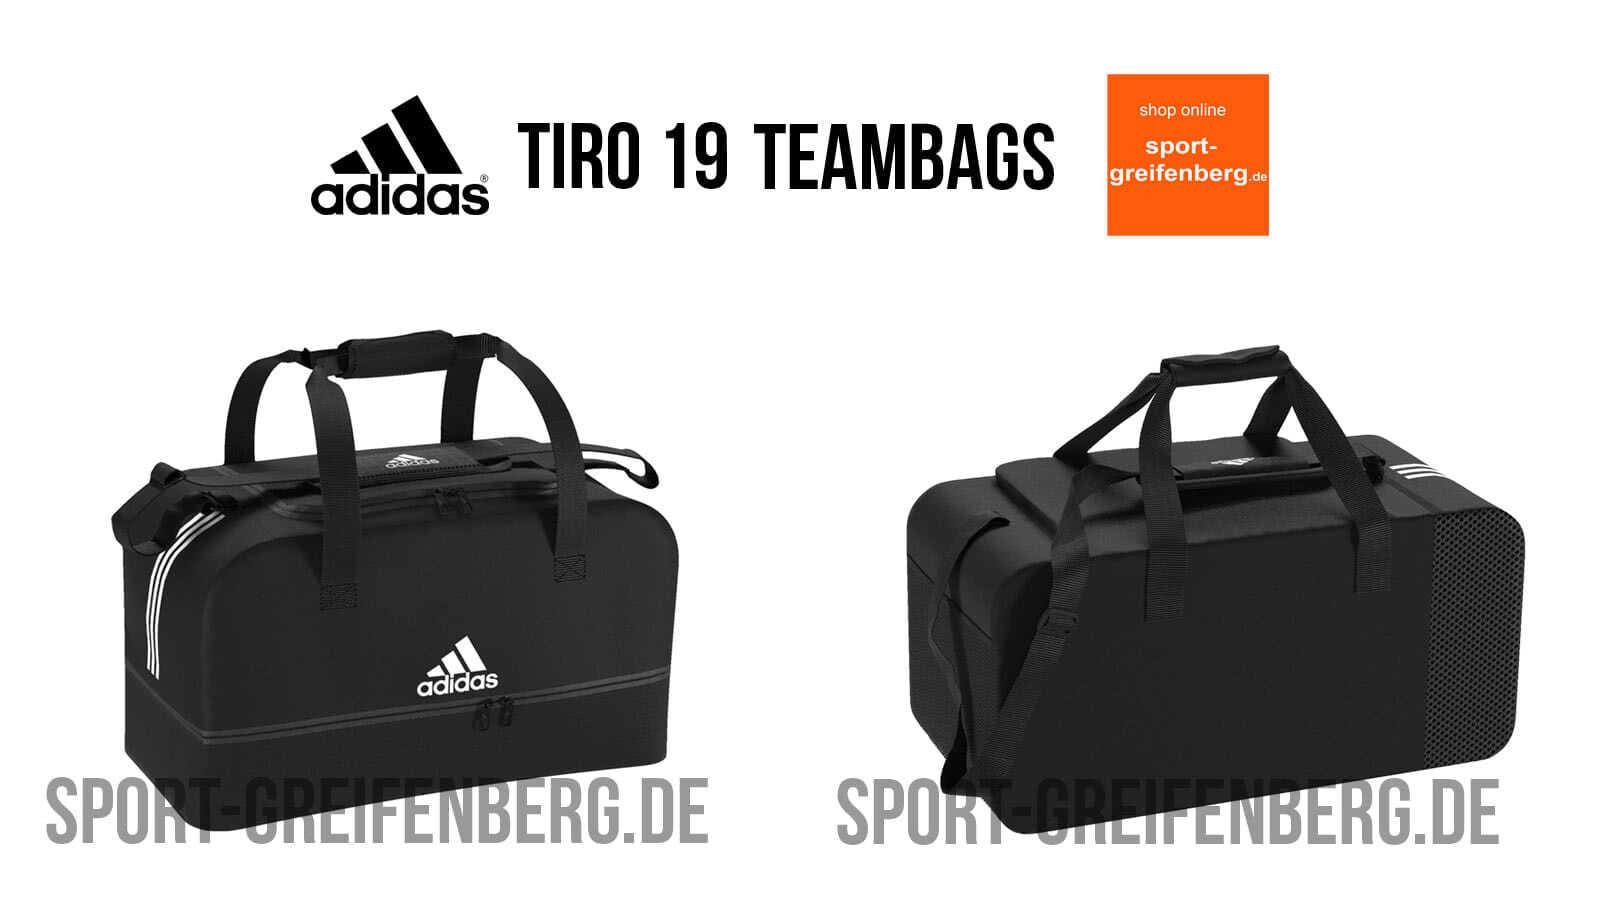 adidas Tiro 19 Teambag Sporttaschen (20192020) ✓ Teambag